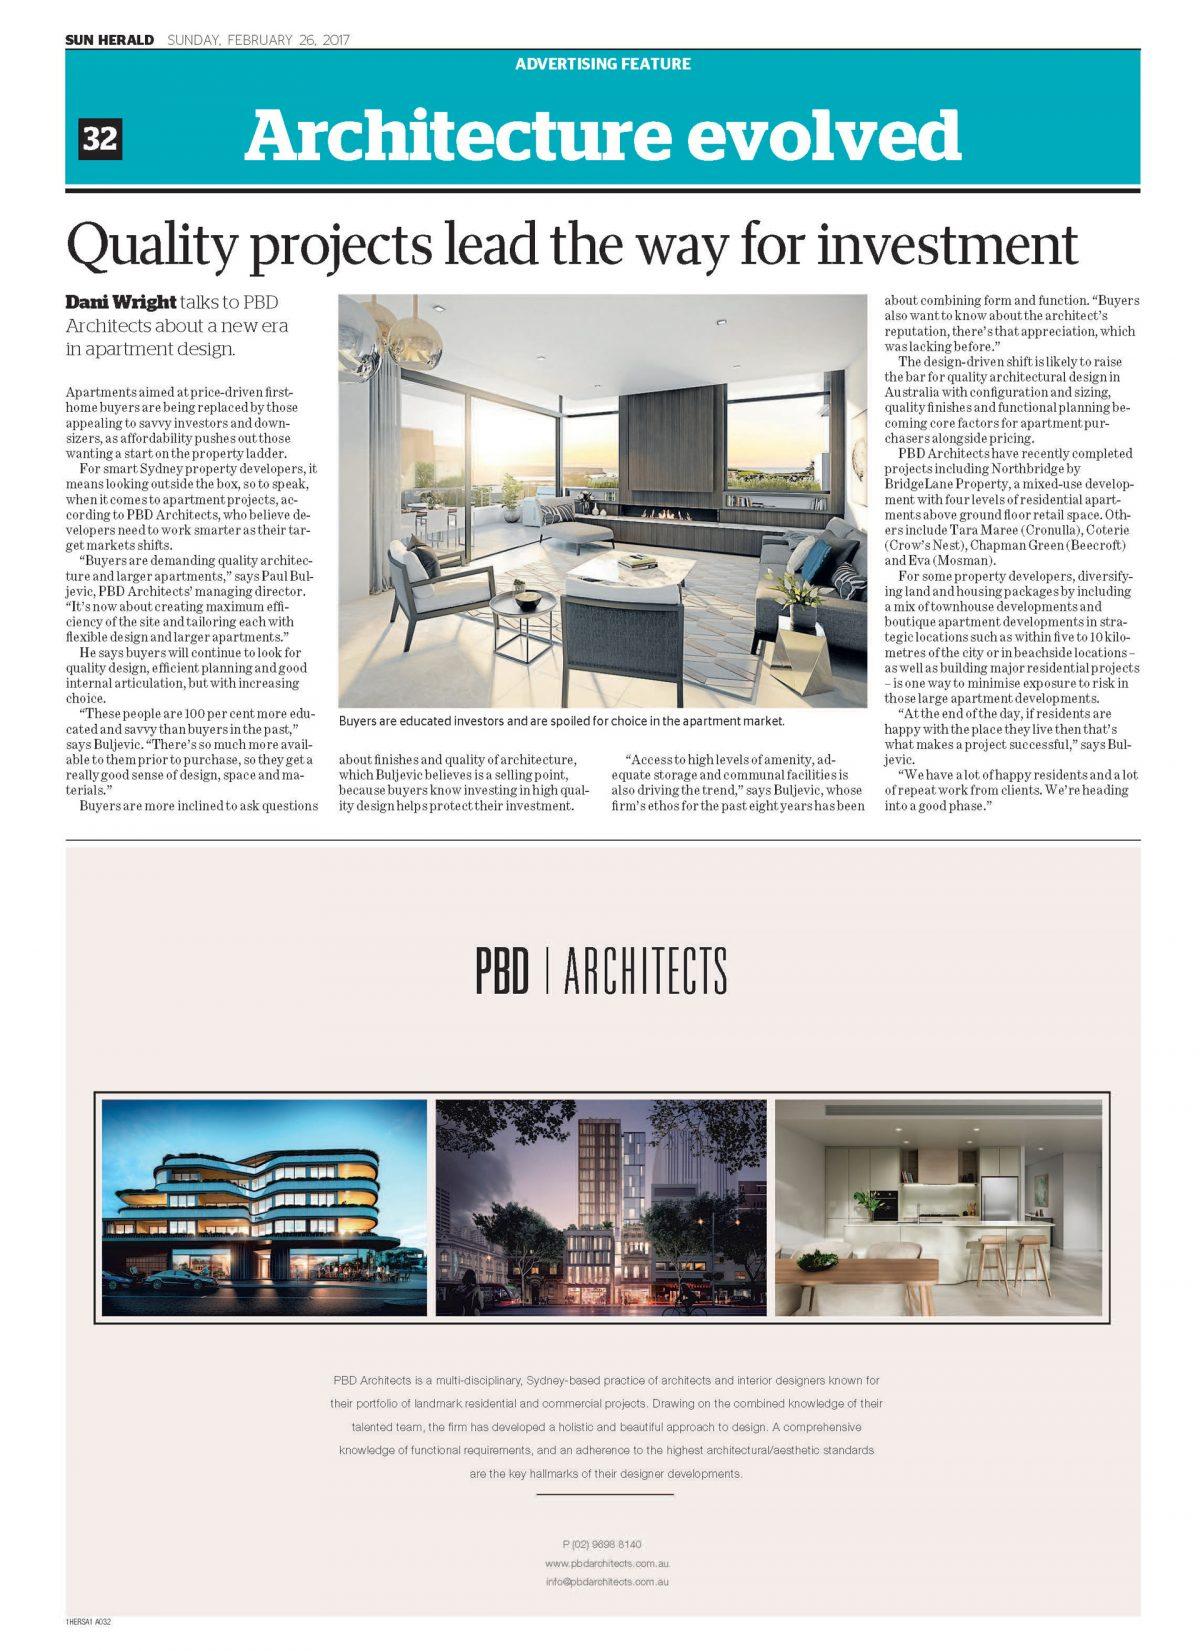 Architecture Evolved – SMH